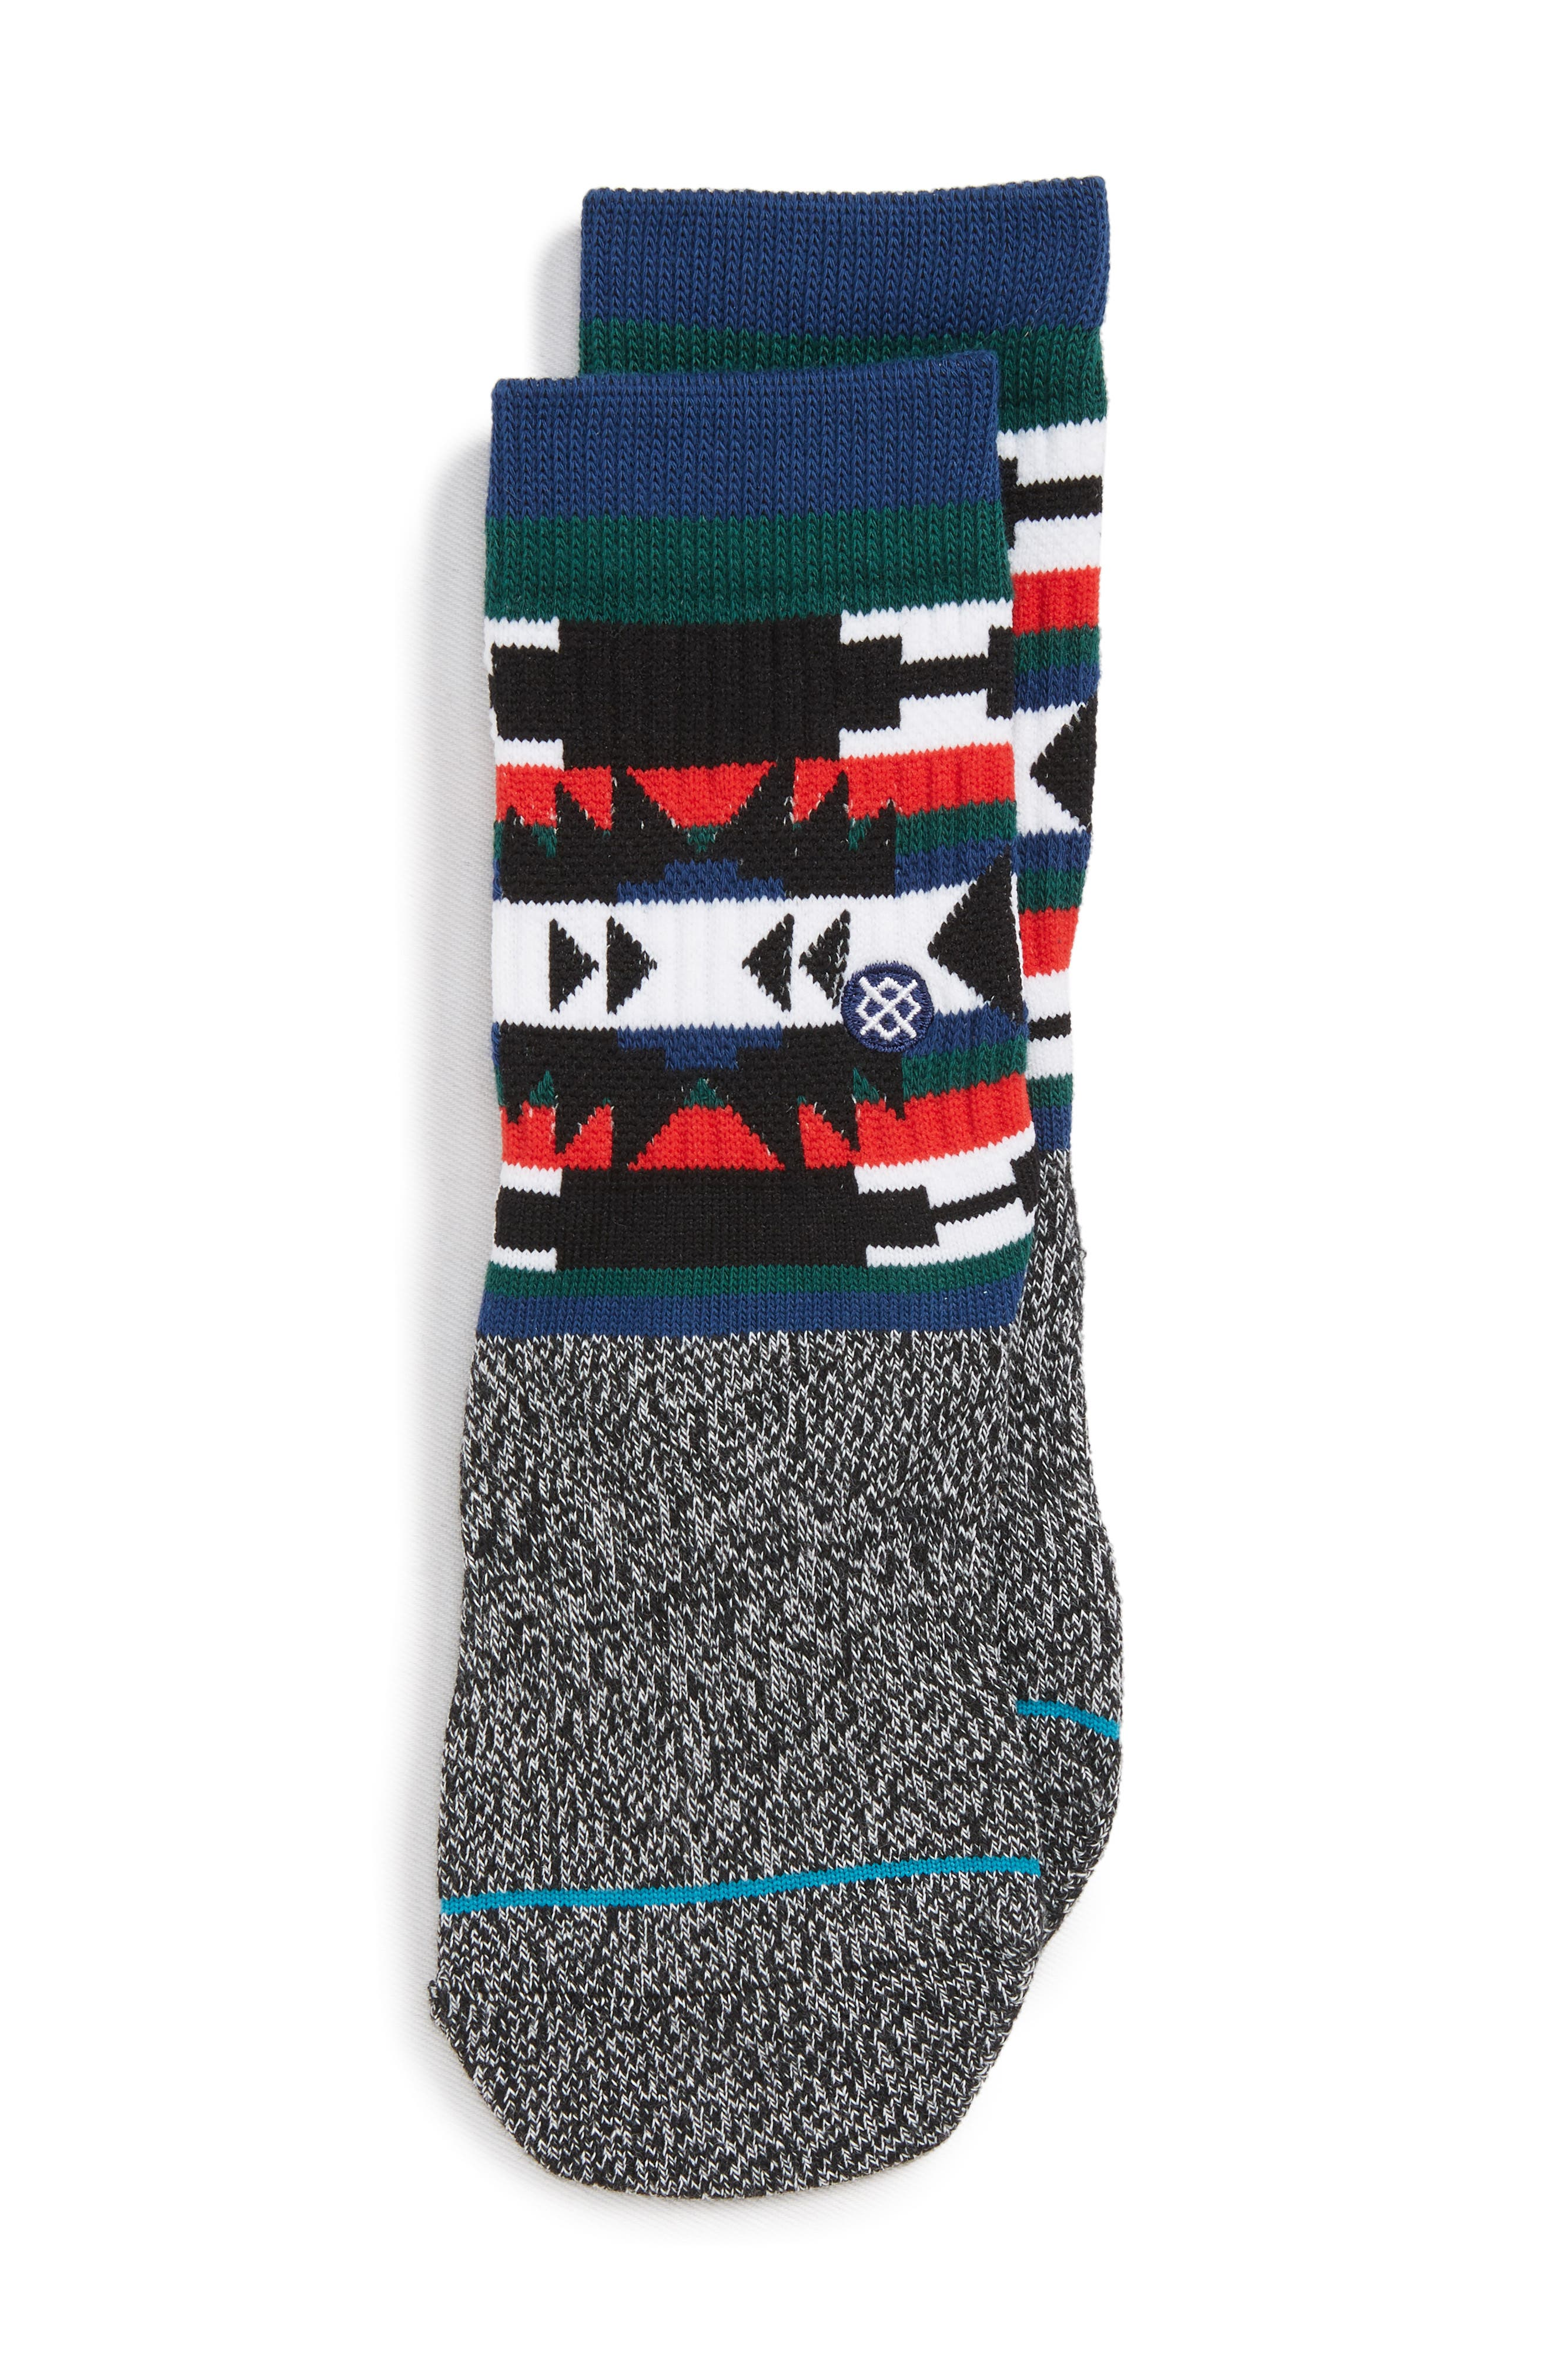 Seapunk Geo Pattern Socks,                             Main thumbnail 1, color,                             020